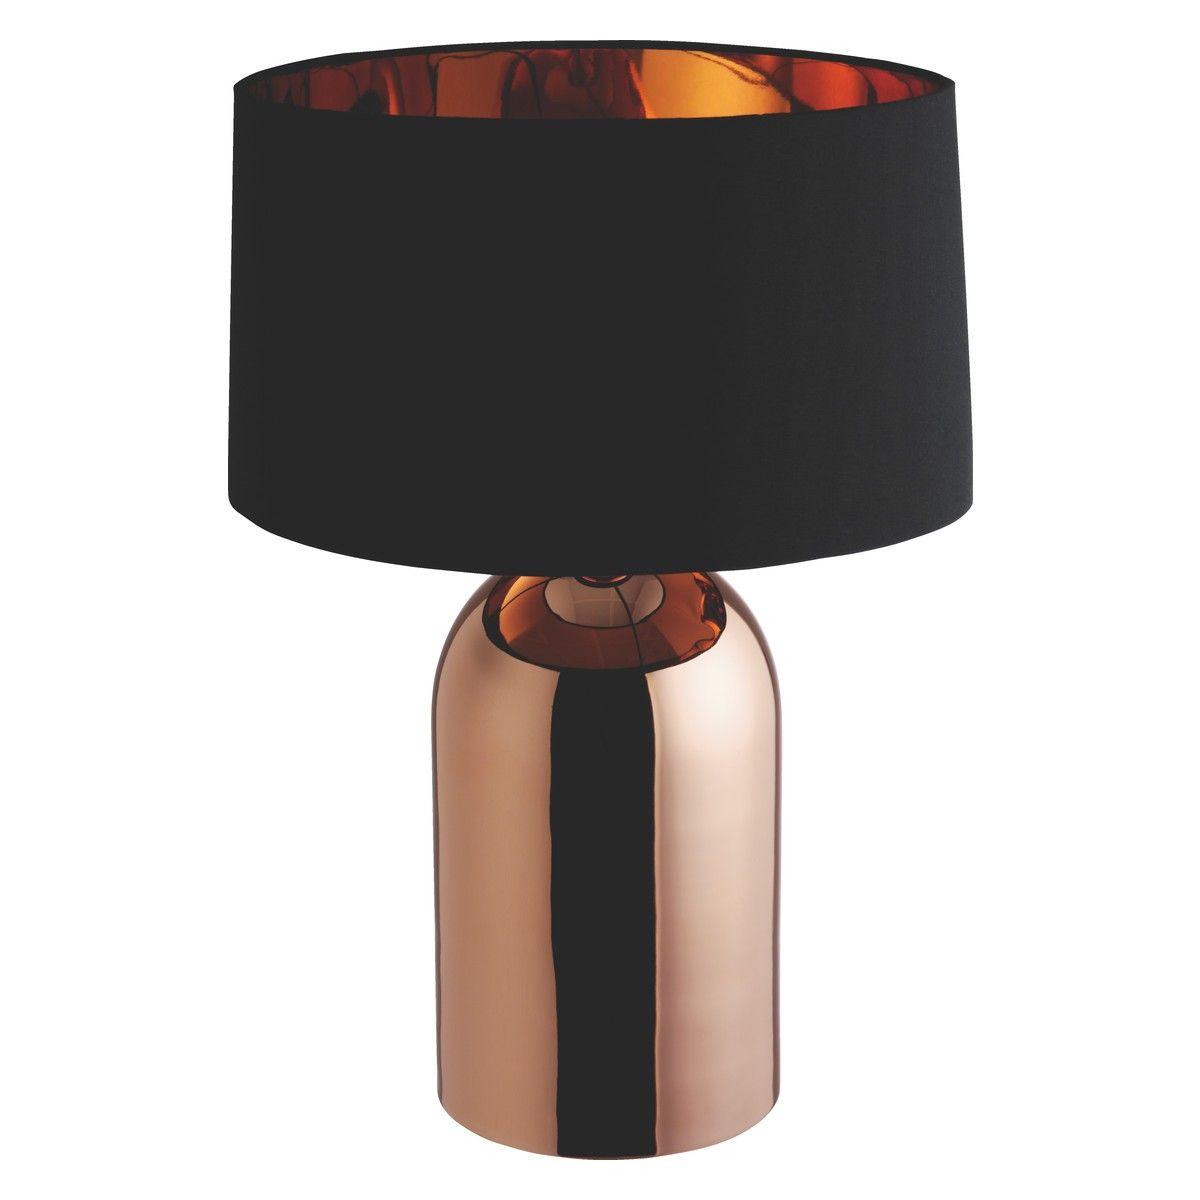 Copper Table Lamp Uk